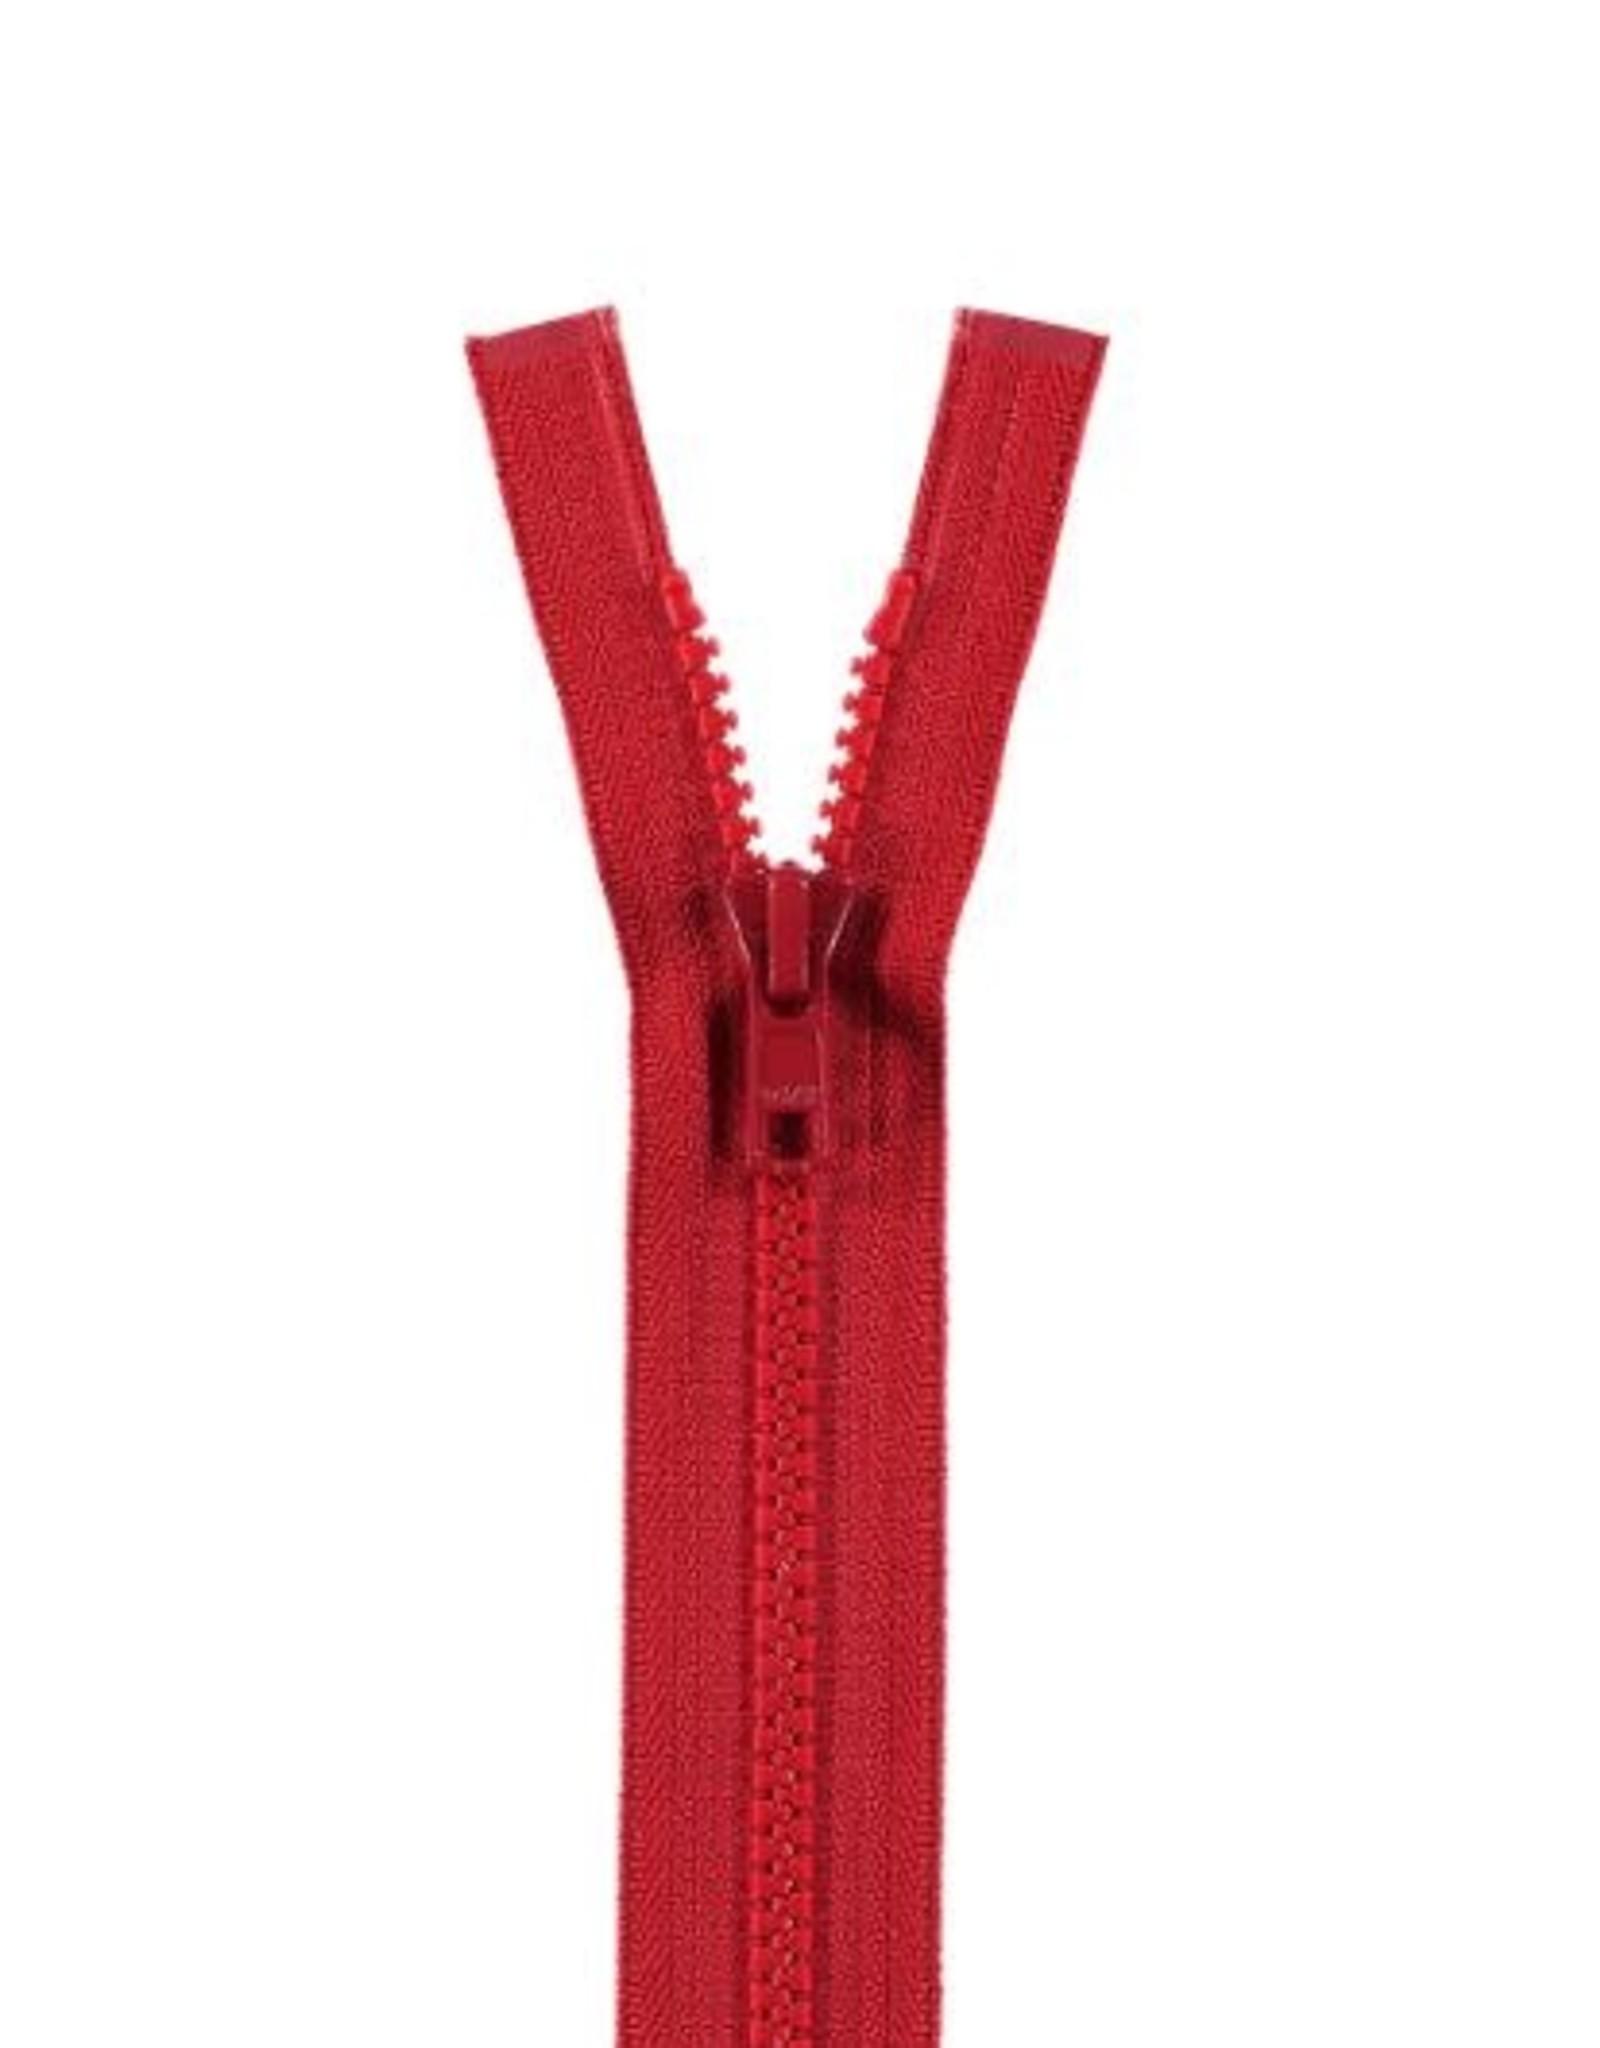 YKK BLOKRITS 5 DEELBAAR rood 519-80cm